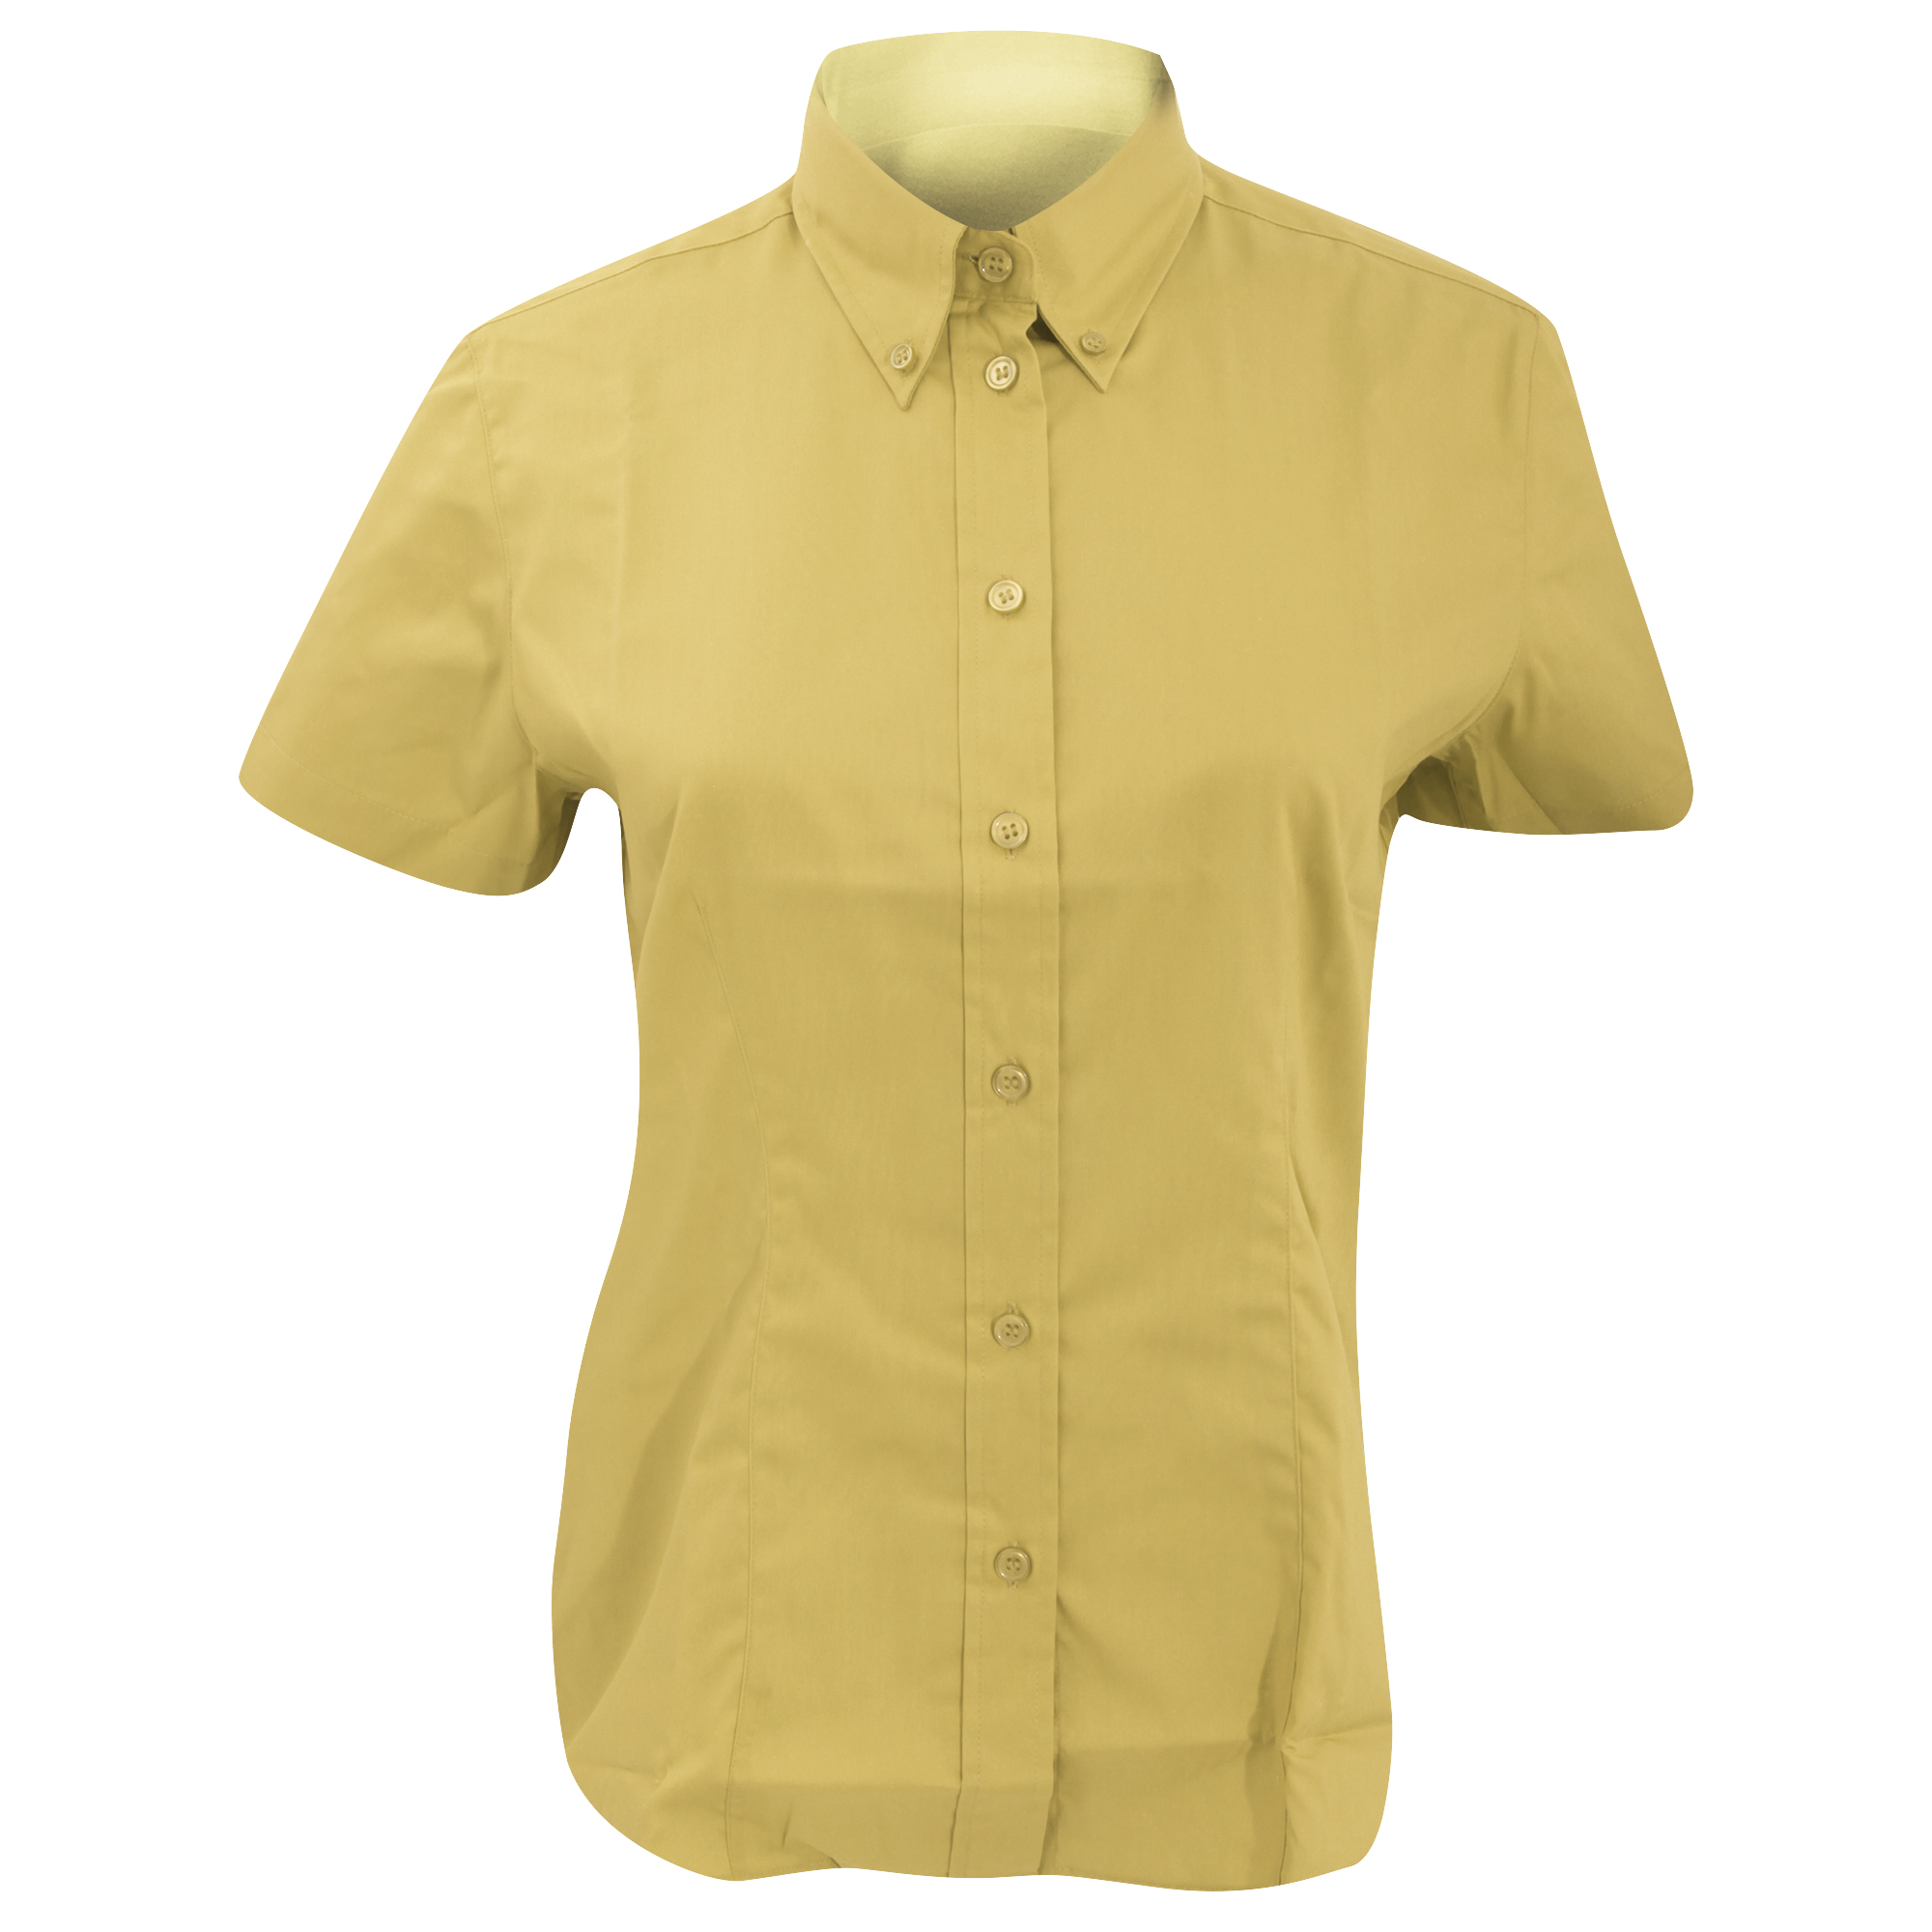 Kustom Kit Ladies Corporate Oxford Short Sleeve Shirt (24) (Charcoal)